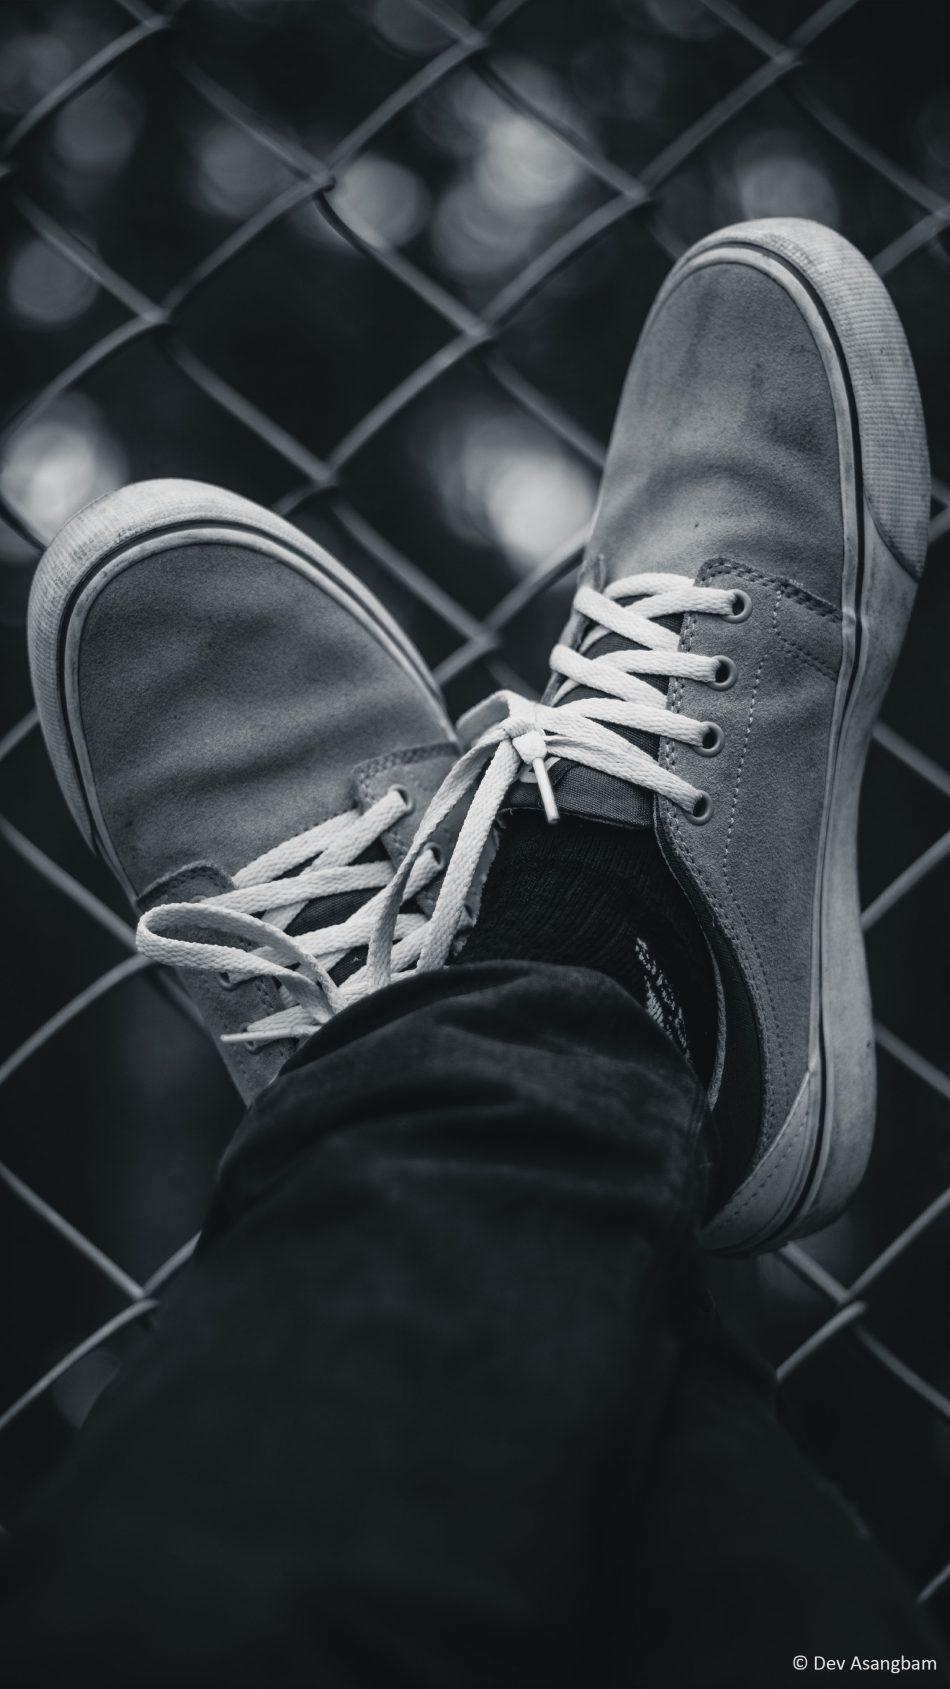 Sneakers Black White Photography 4k Ultra Hd Mobile Black And White Wallpaper 4k 950x1689 Wallpaper Teahub Io